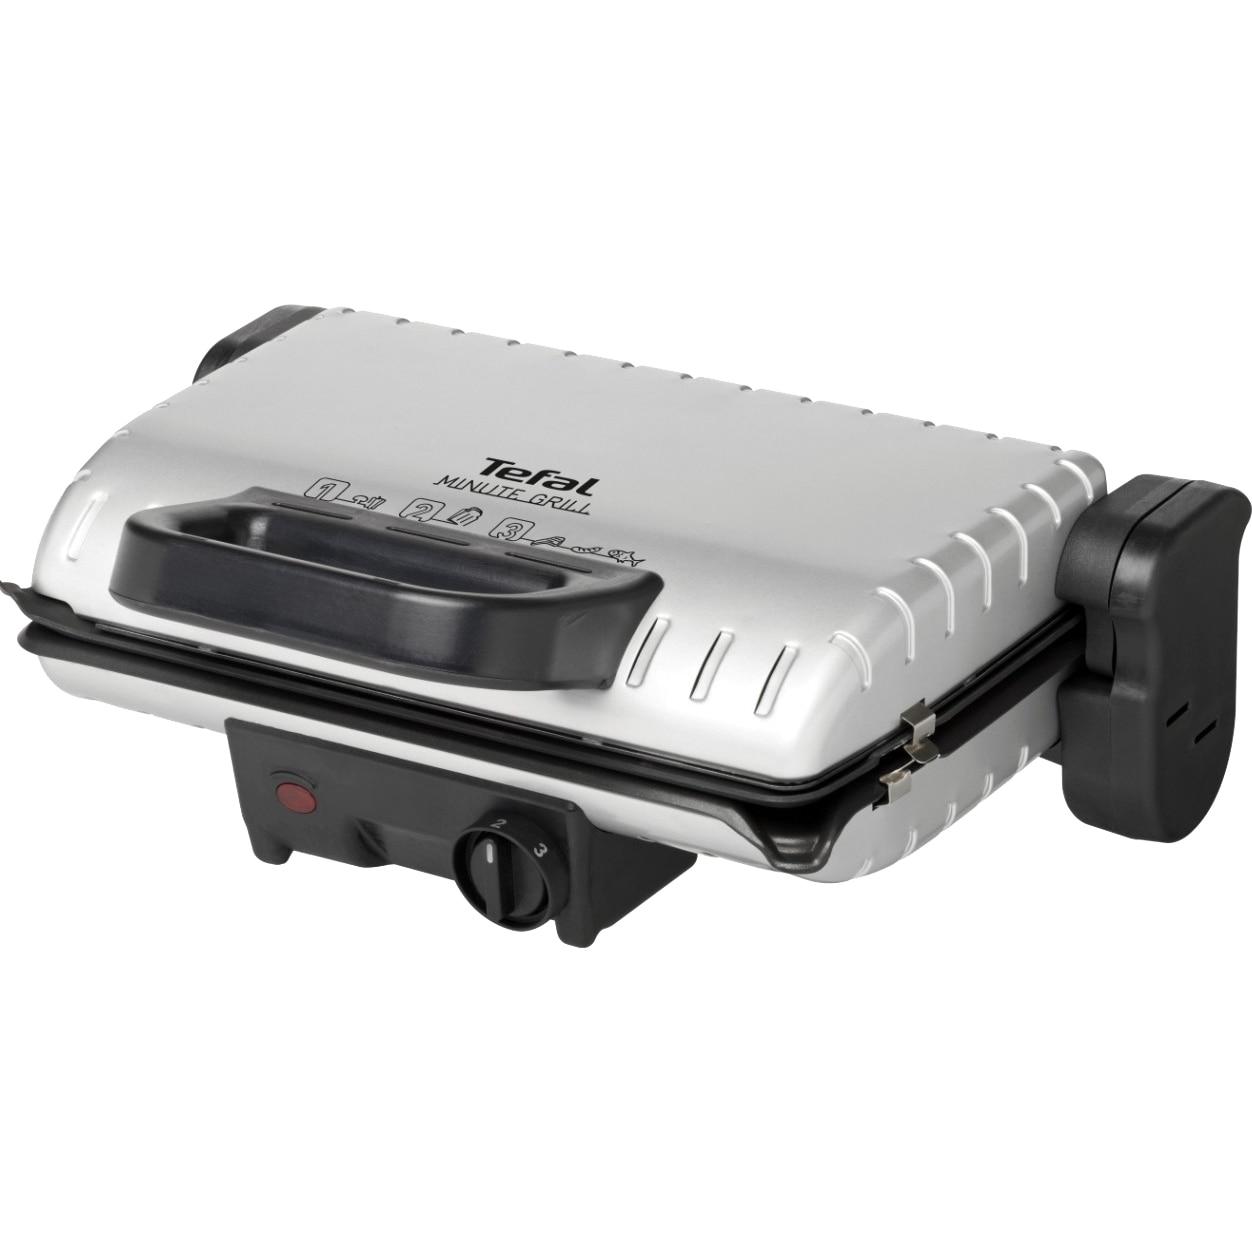 Fotografie Gratar electric Tefal GC205012, 1600 W, 21 x 33.5 cm, Negru/Gri